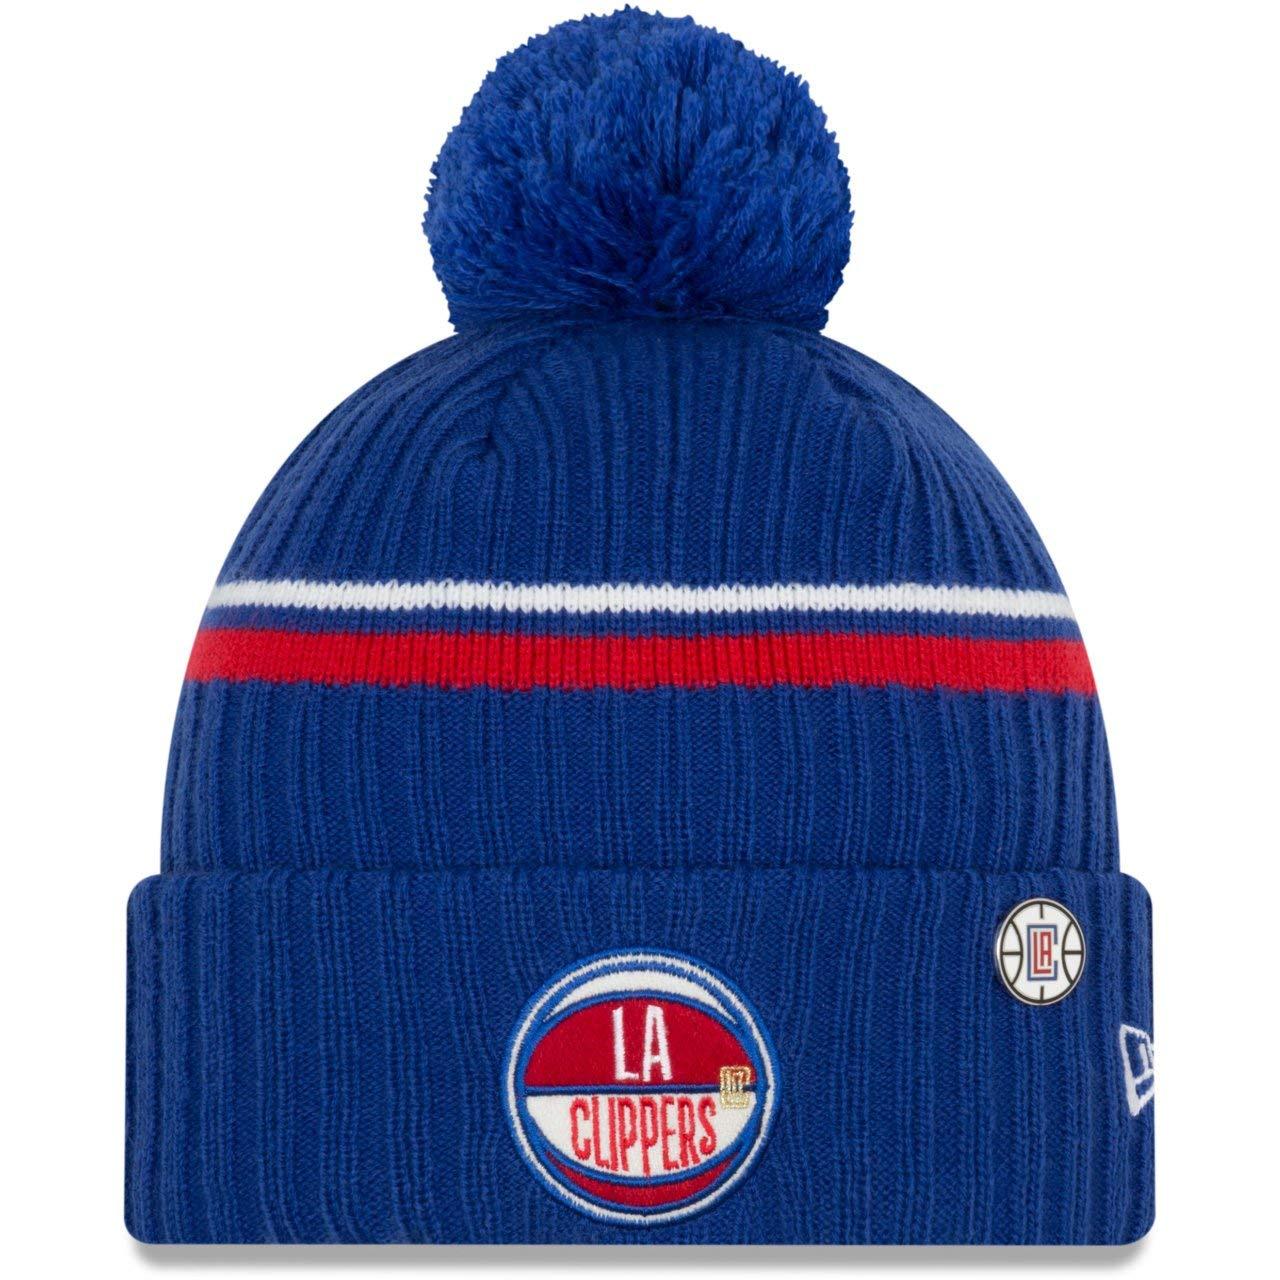 New Era NBA 2019 Draft Knit Bobble Hat